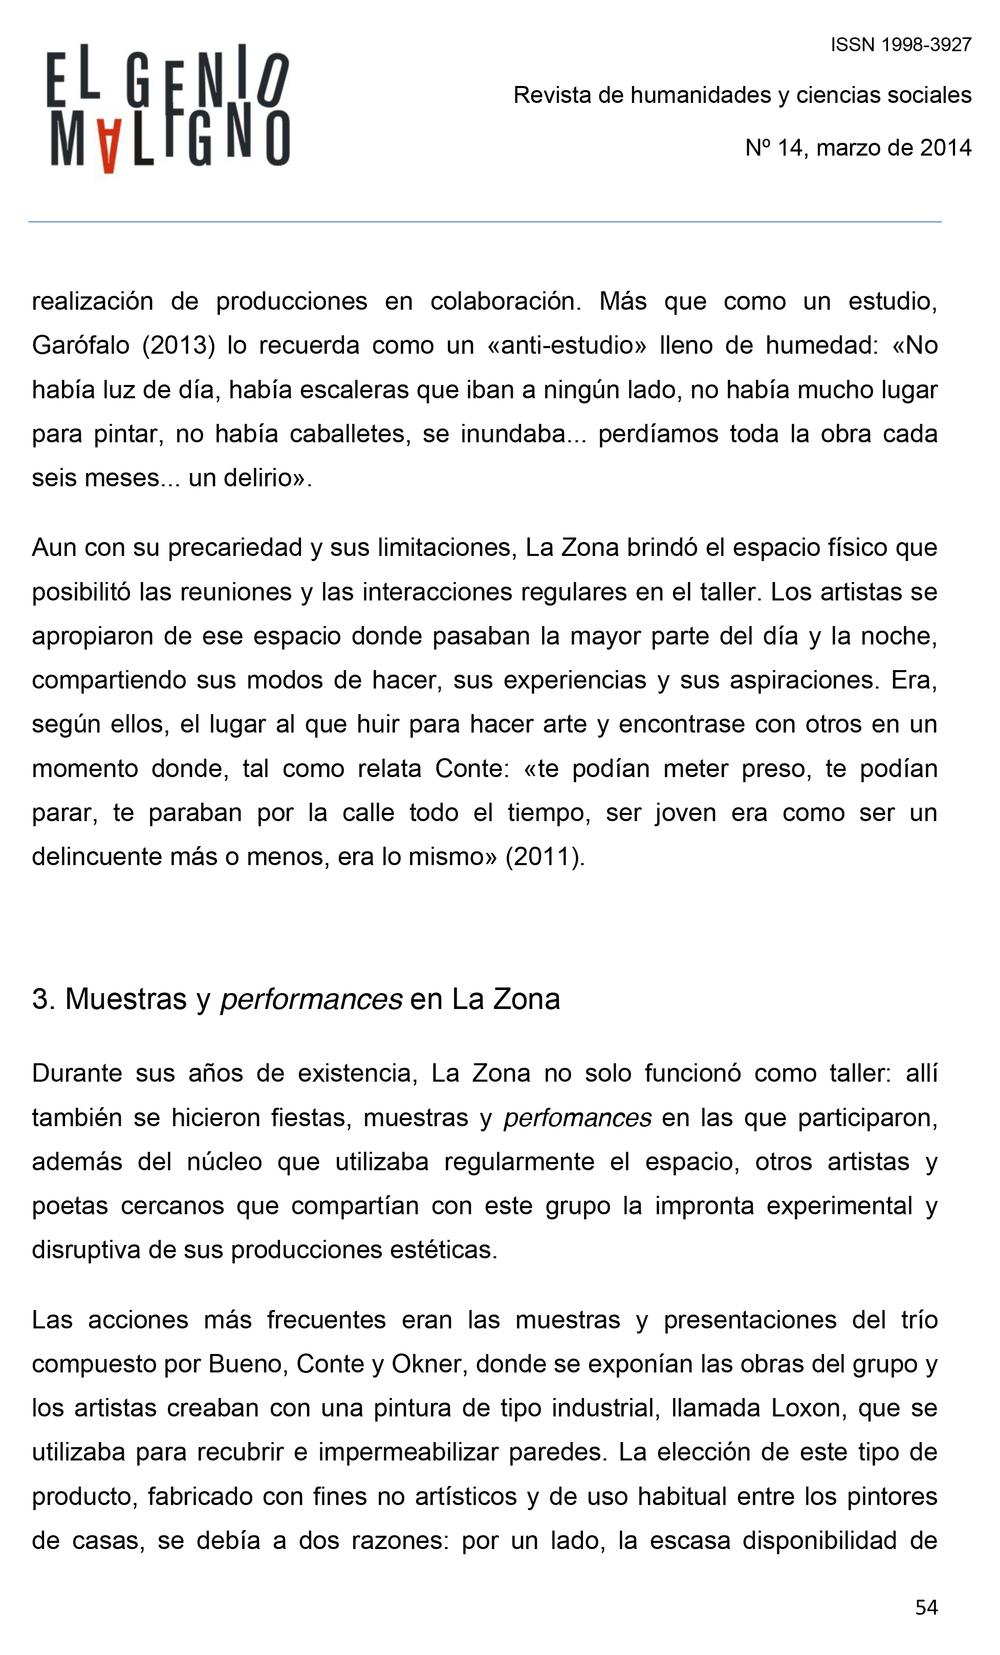 materia2_inhibición_lazonaloxoneinstein_dlucena-12.jpg